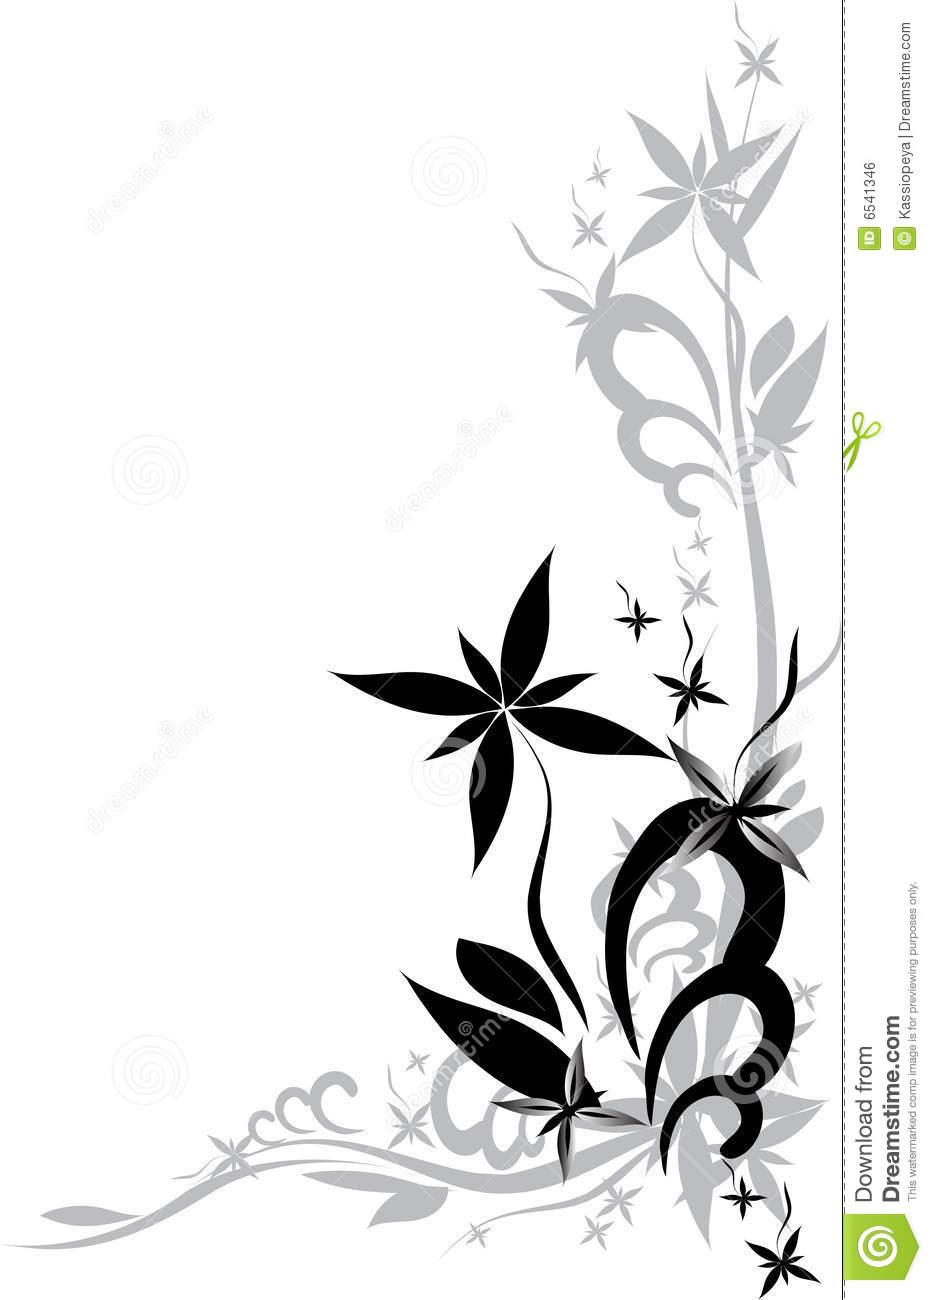 Flowery graphics jpg free Graphic flower - ClipartFox jpg free